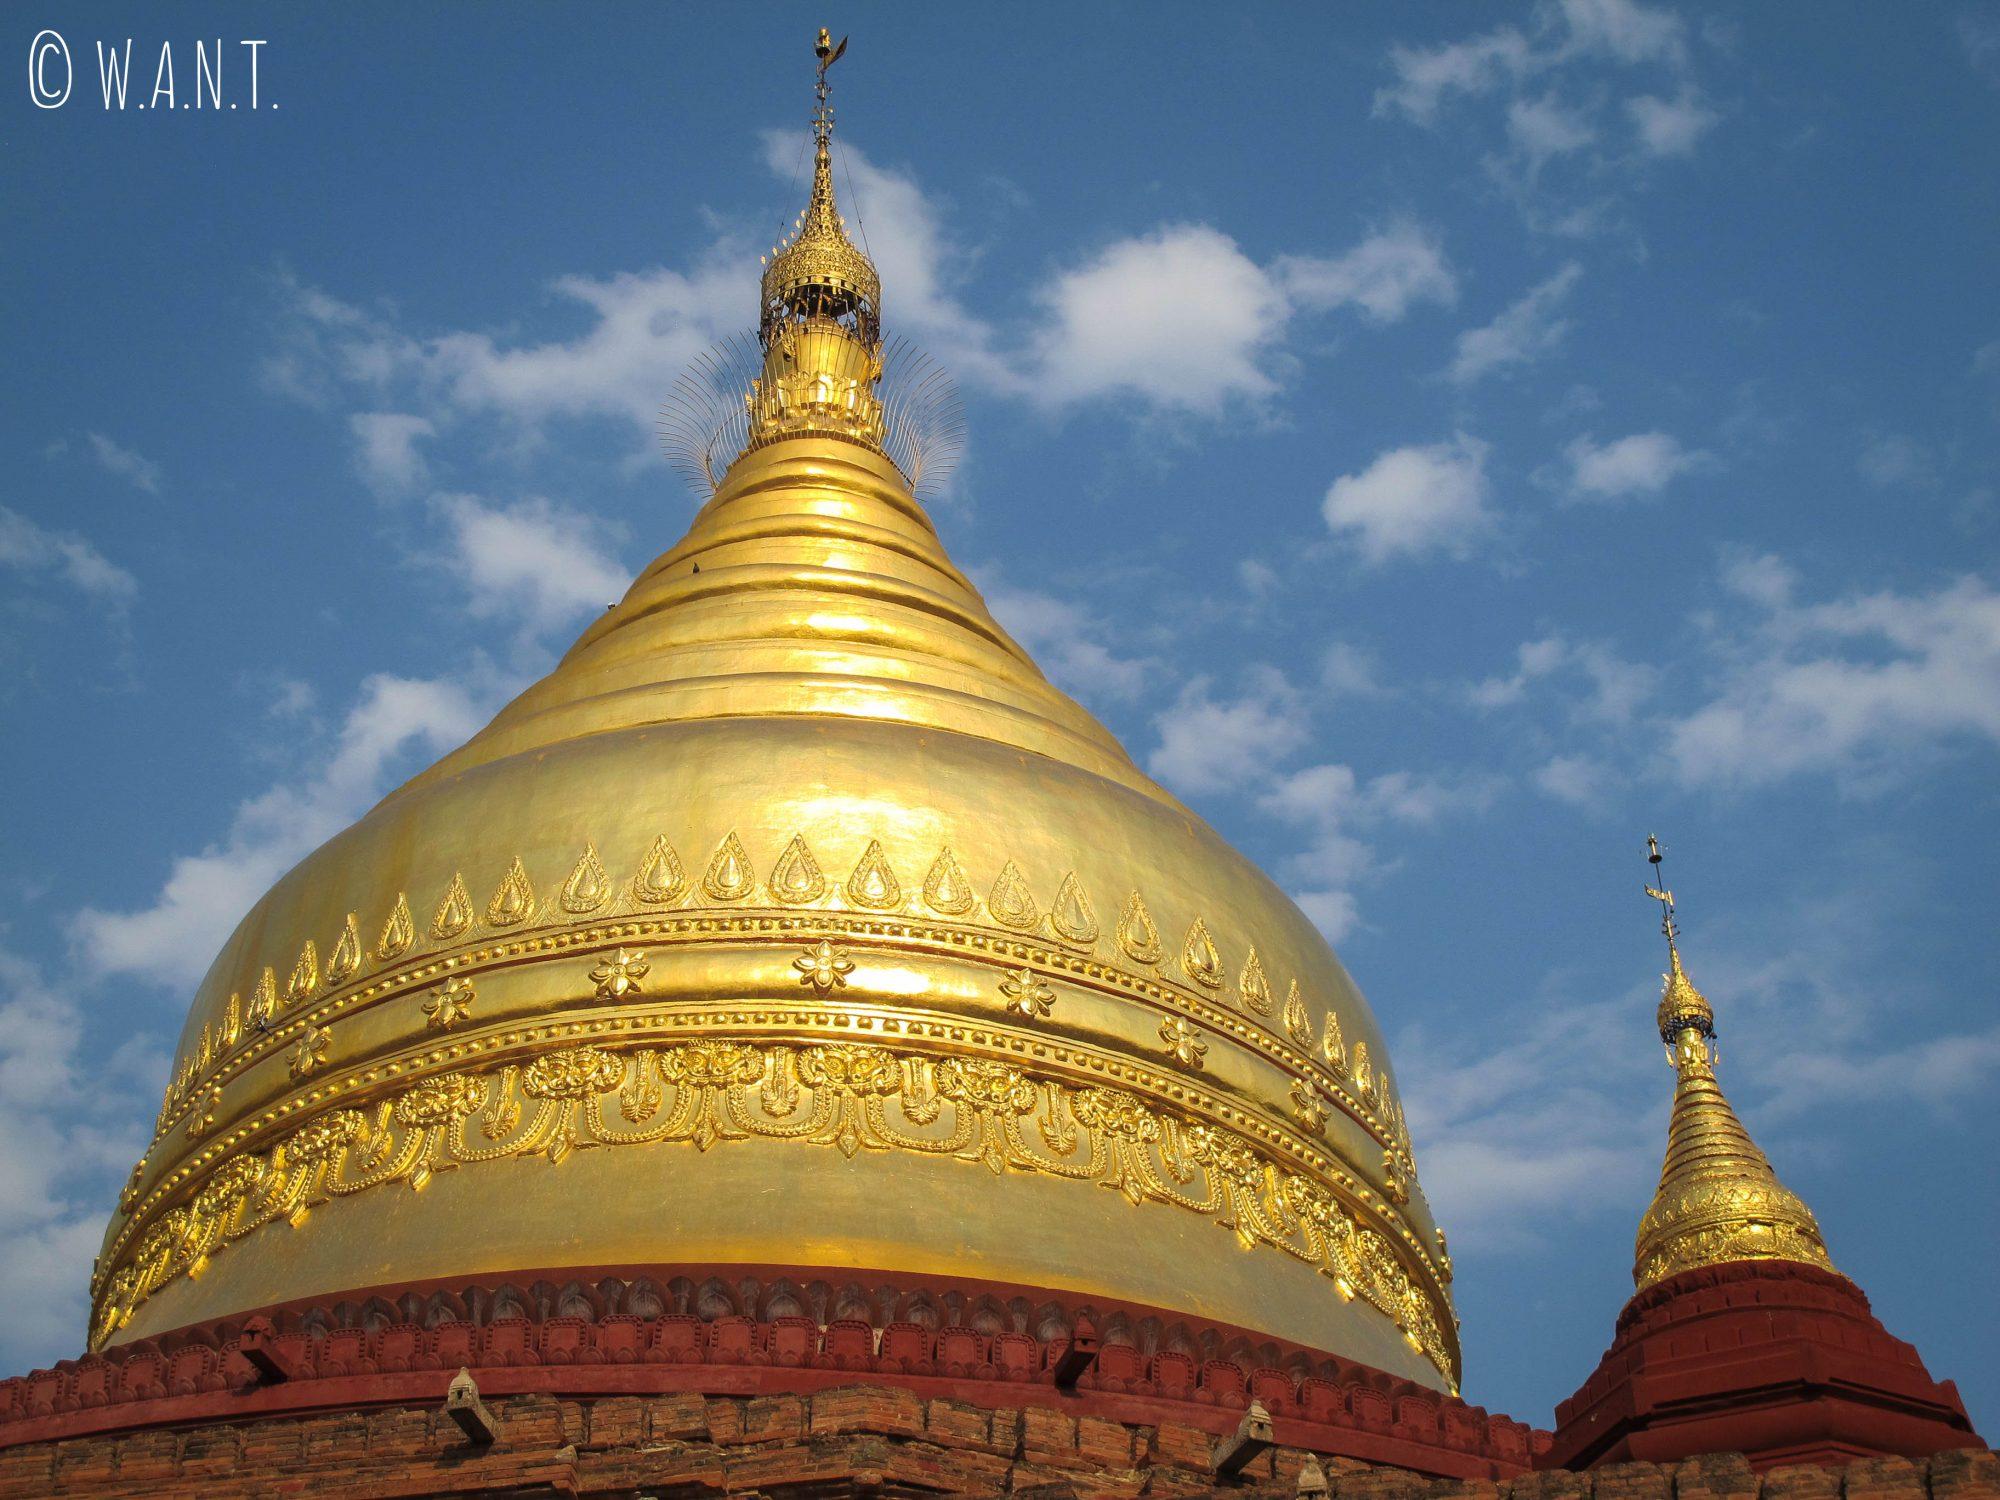 Stupa en or de la pagode Dhammayanzika